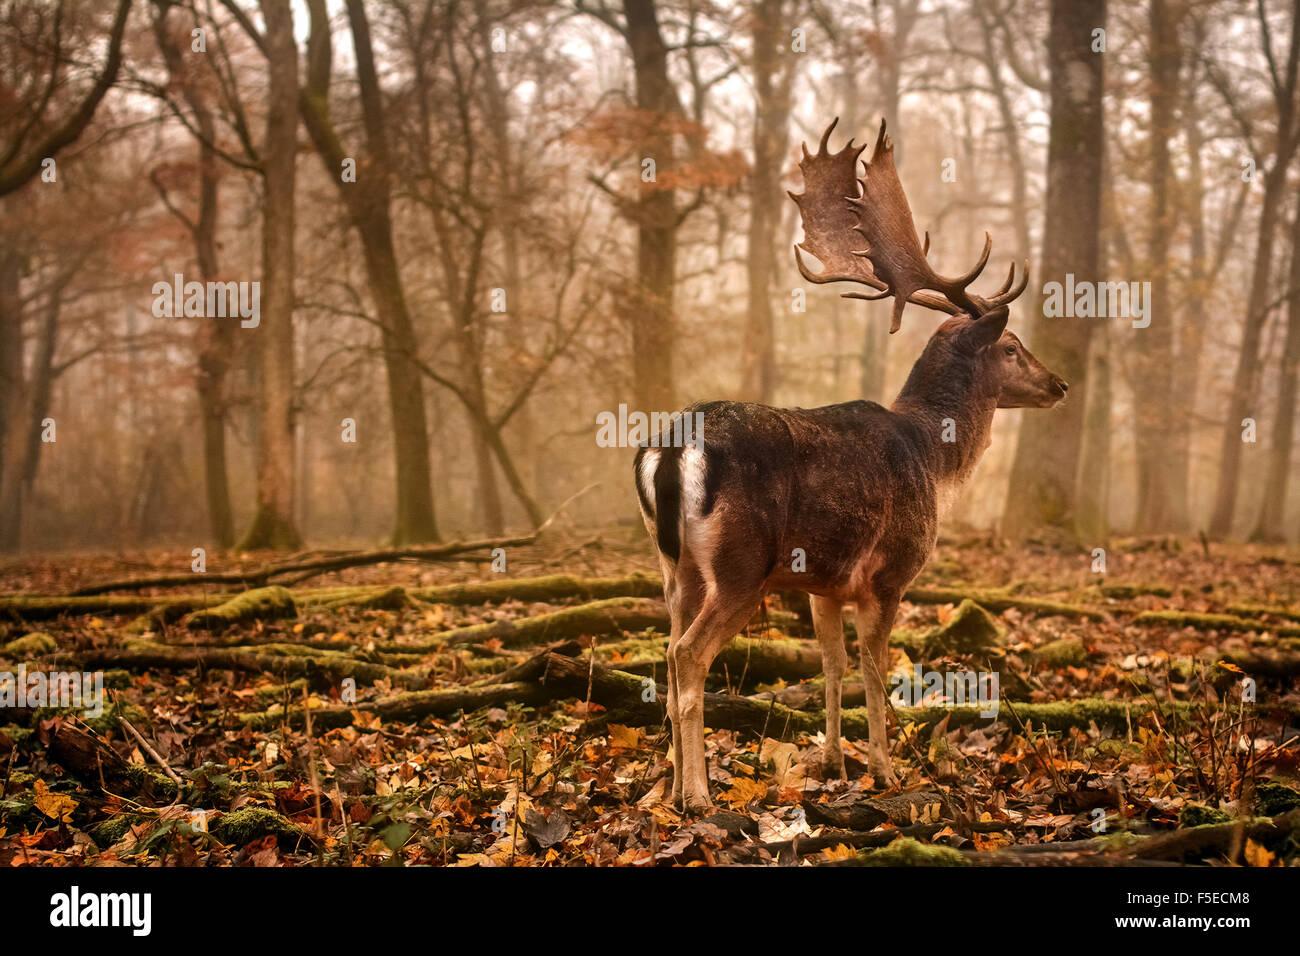 Brache lieber in nebligen Wald Stockbild